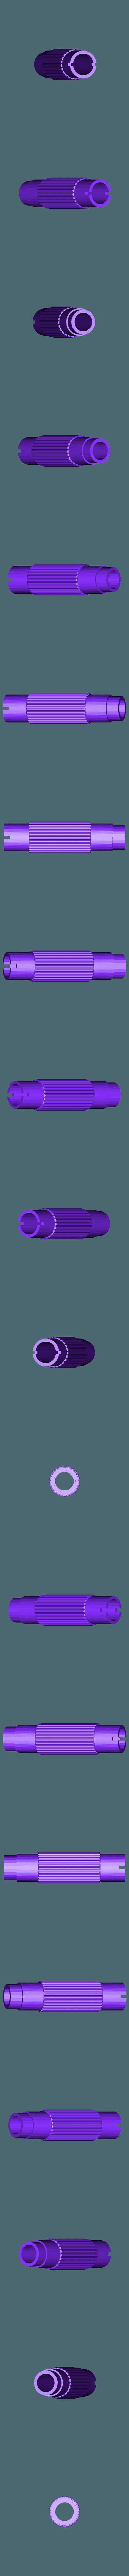 dexter_part.stl Download free STL file Dexter replacement part • 3D printer template, Inglebard